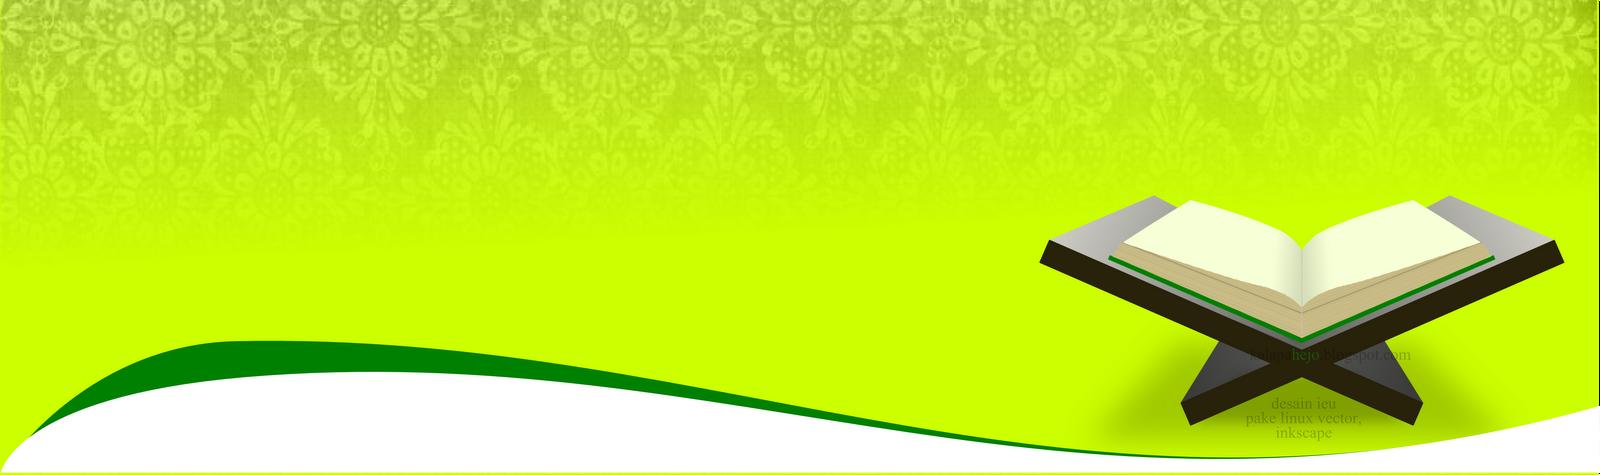 Green Graphic Design Definition